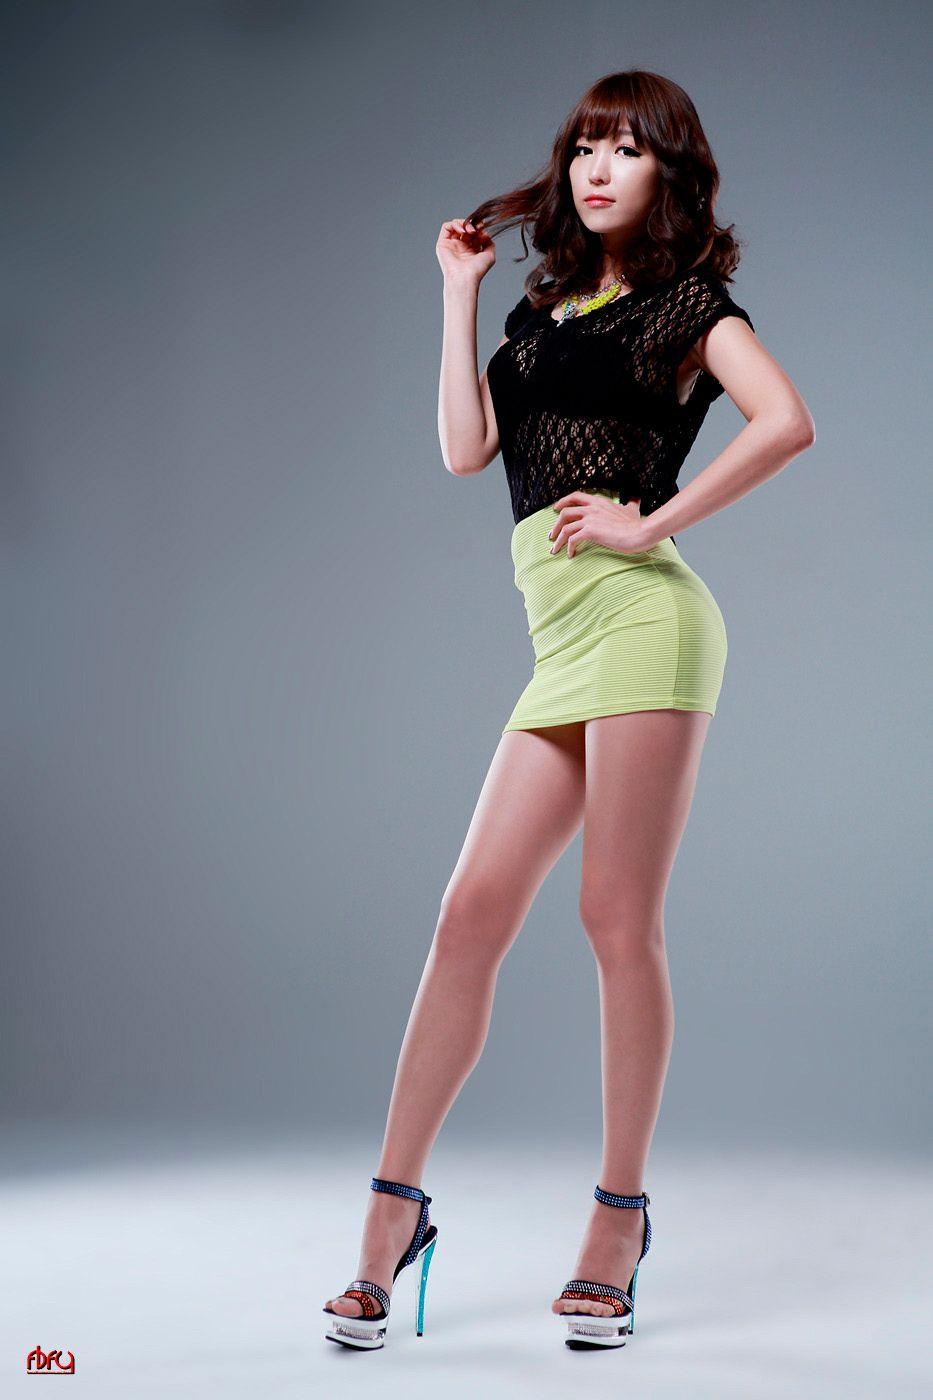 pics-naked-korean-girls-sexy-miniskirt